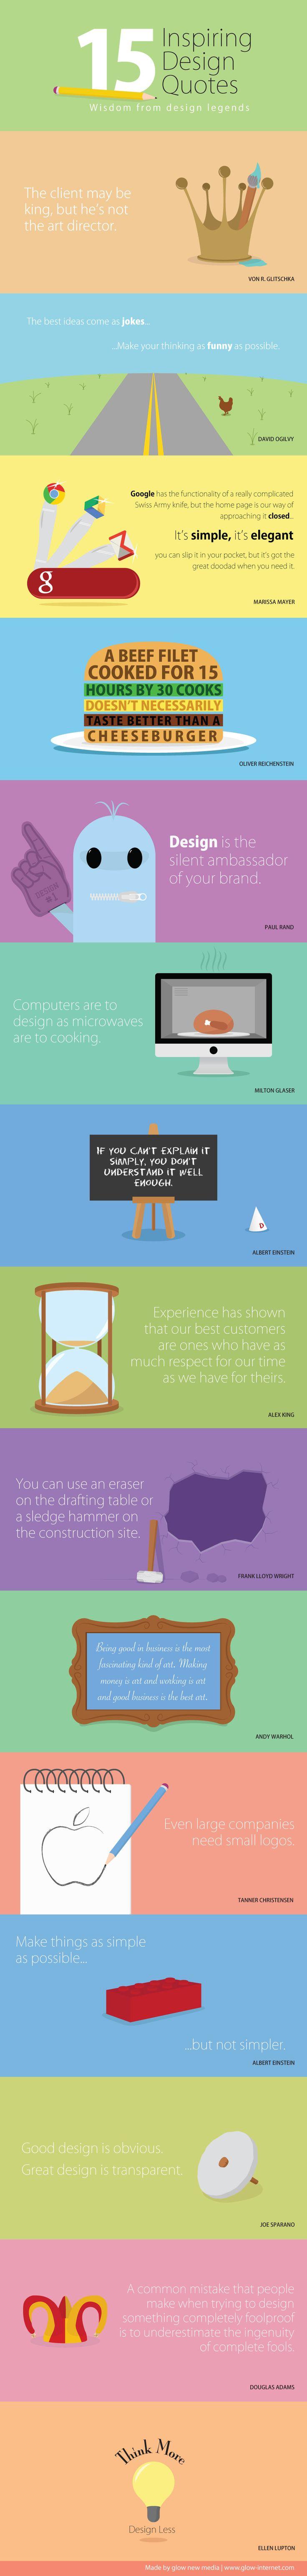 Glow newmedia - 15 Inspiring Design Quotes Infographic